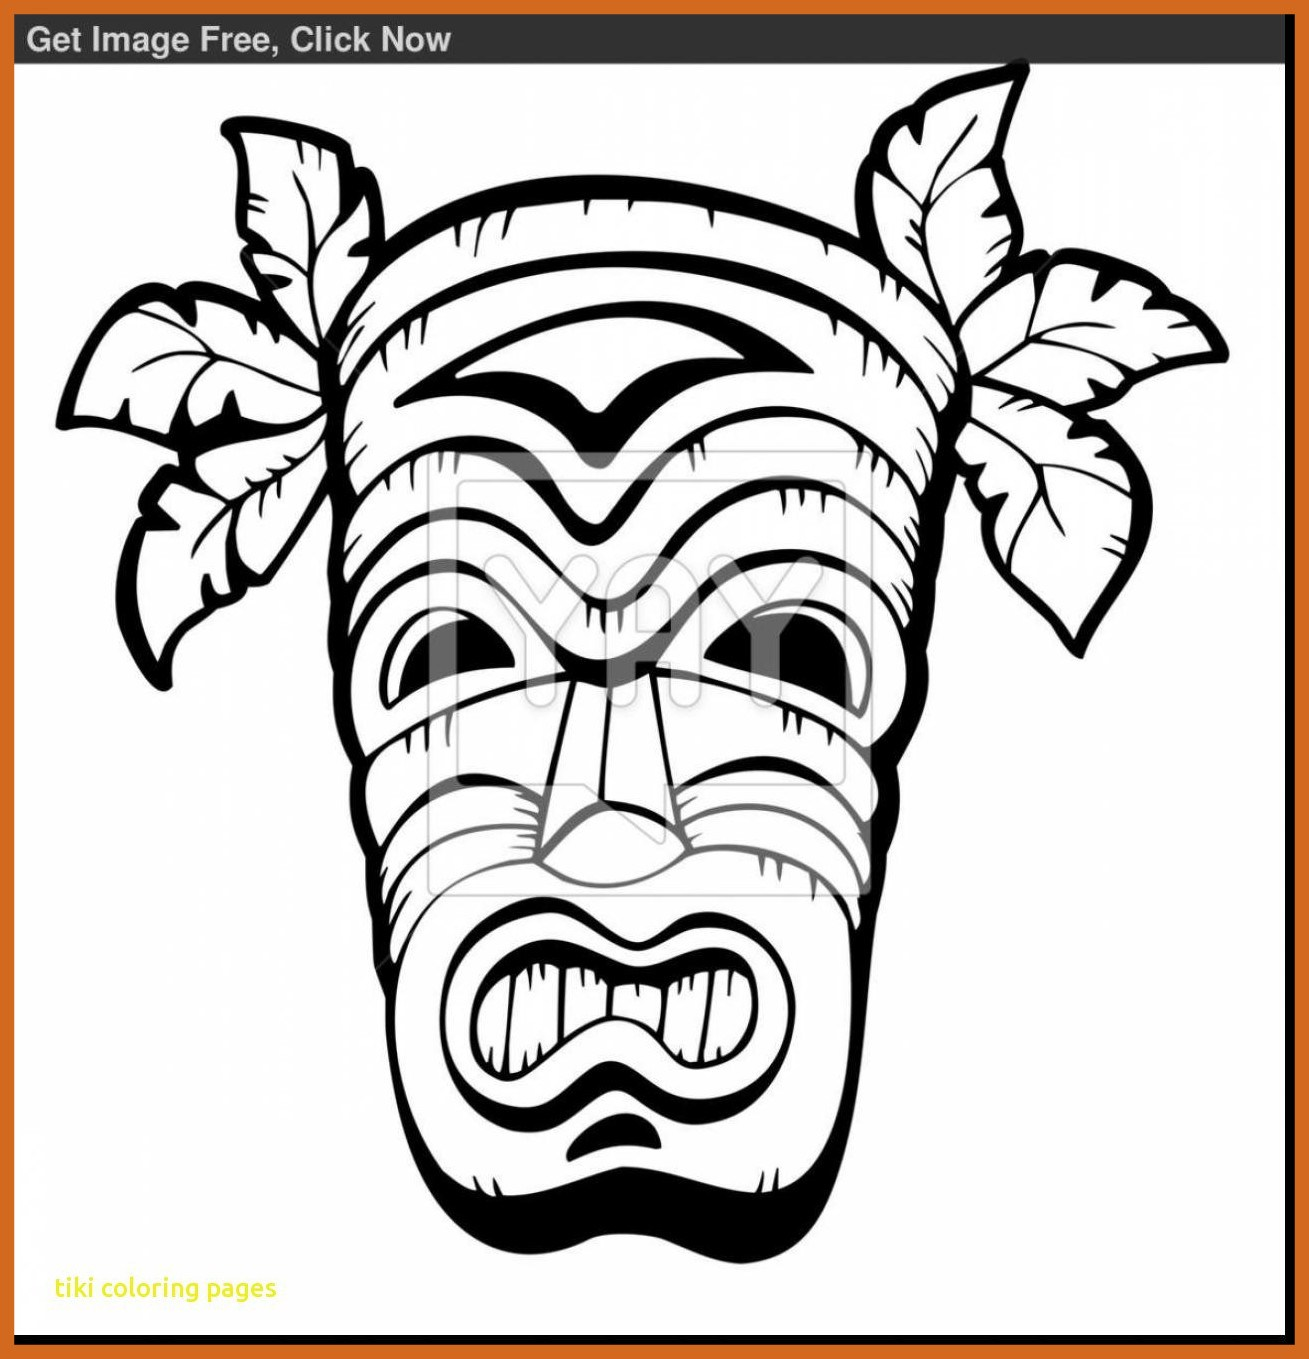 1309x1359 Inspiring Tiki Coloring Pages With Hawaiian Regarding Remodel Pics